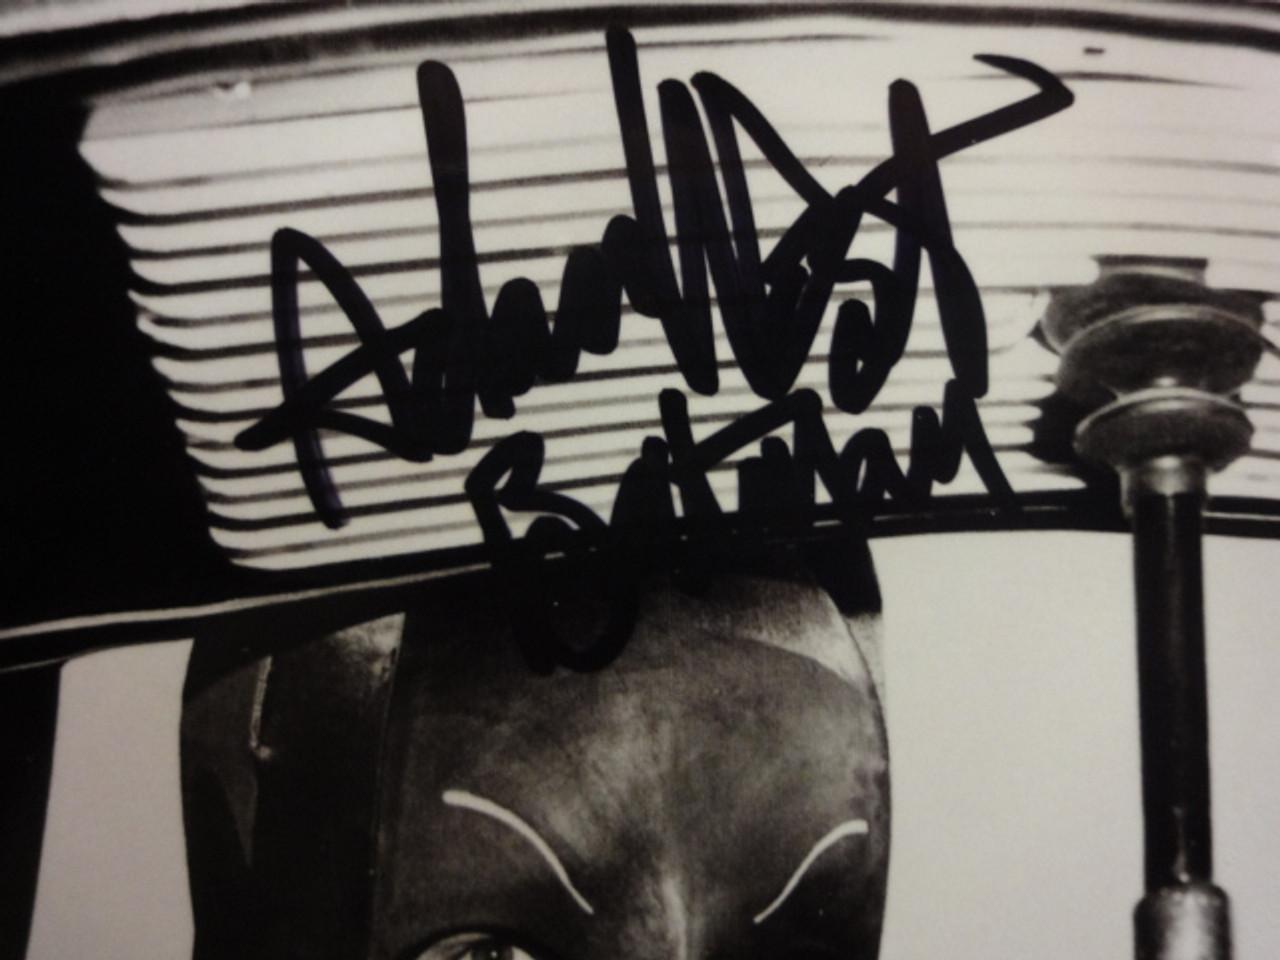 Batman Adam West and Burt Ward Photo Signed Autograph Television Scene